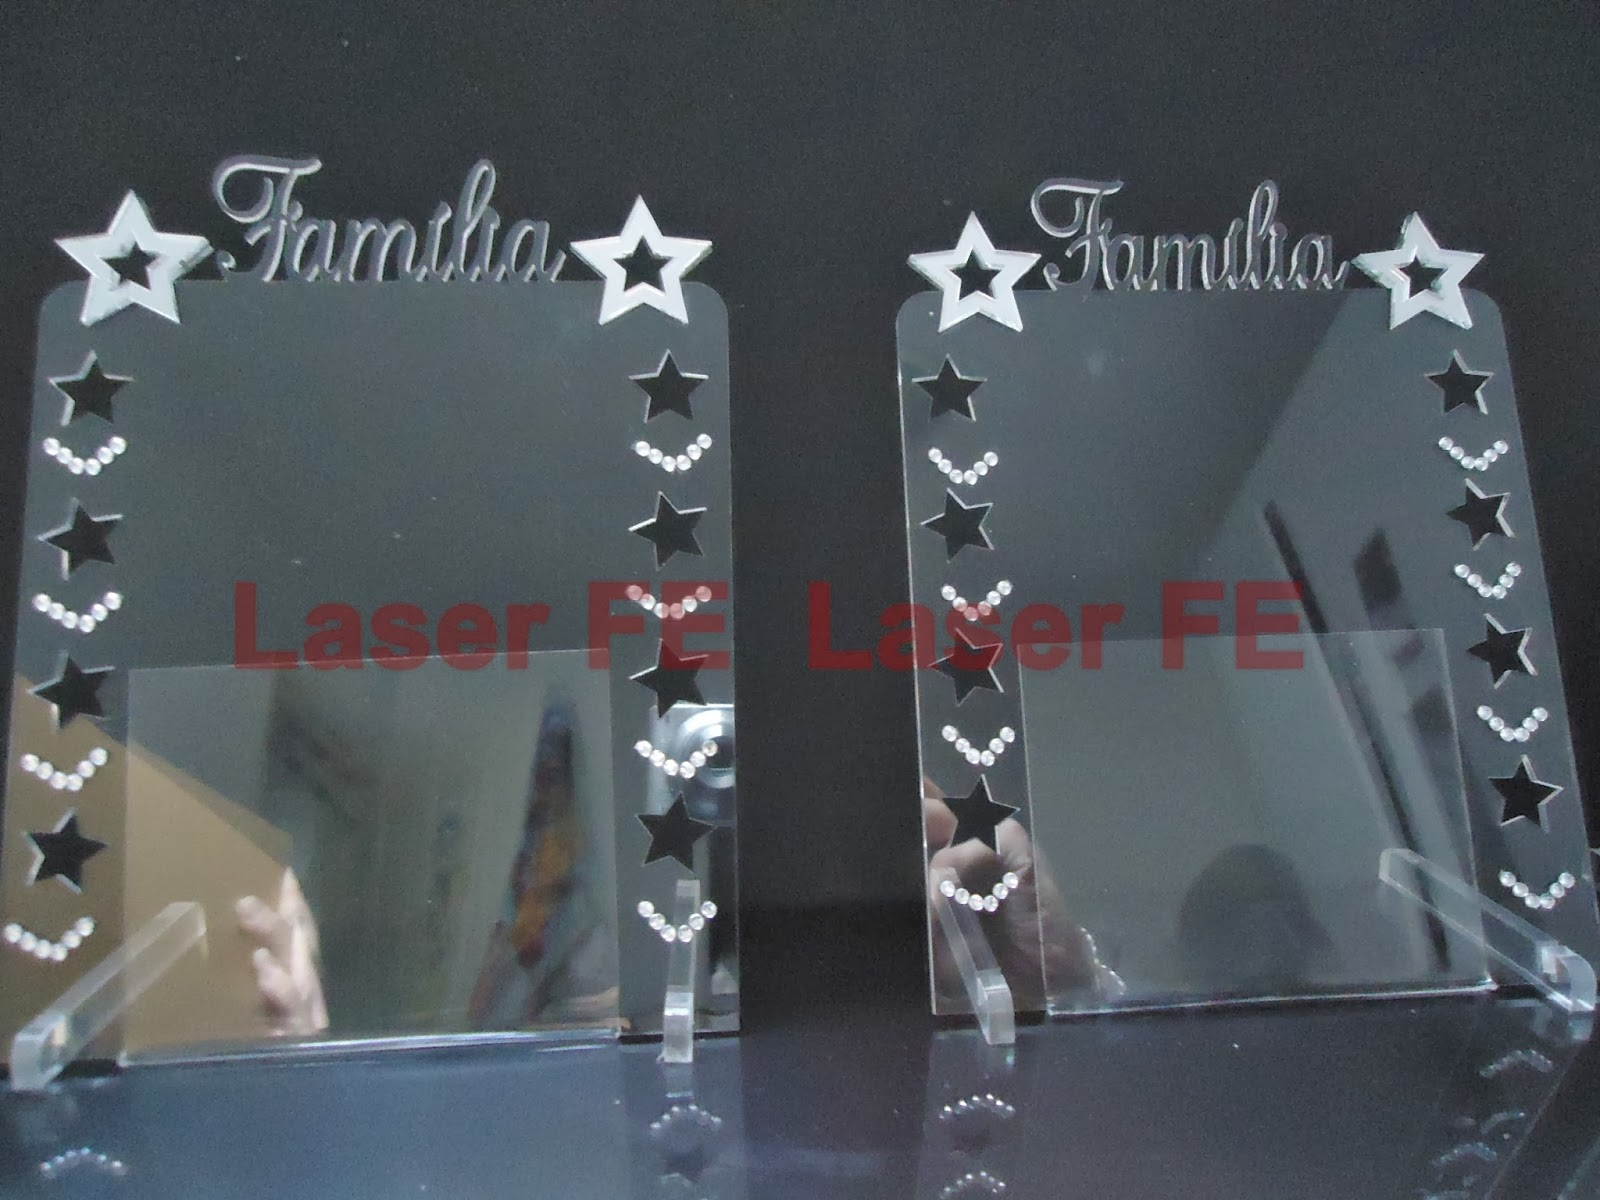 LaserFE: Corte a Laser porta retrato em acrílico! #653A3D 1600x1200